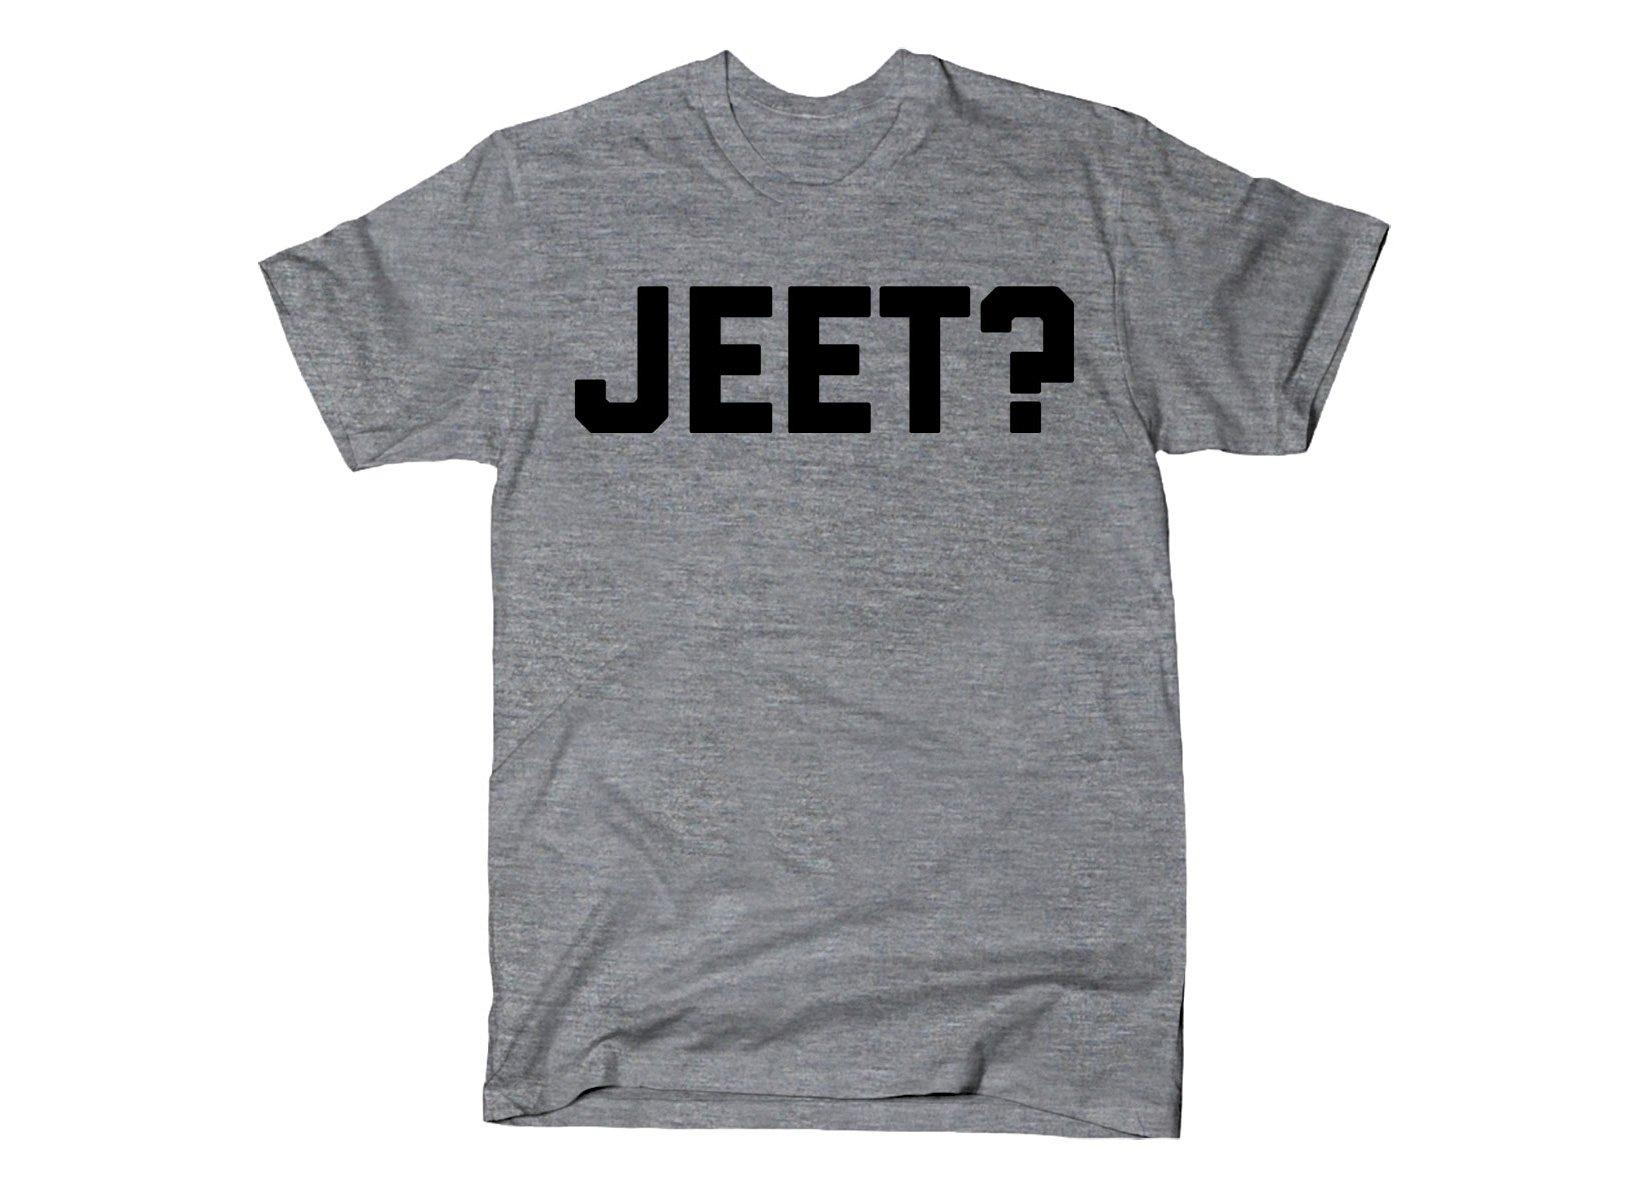 Jeet? on Mens T-Shirt